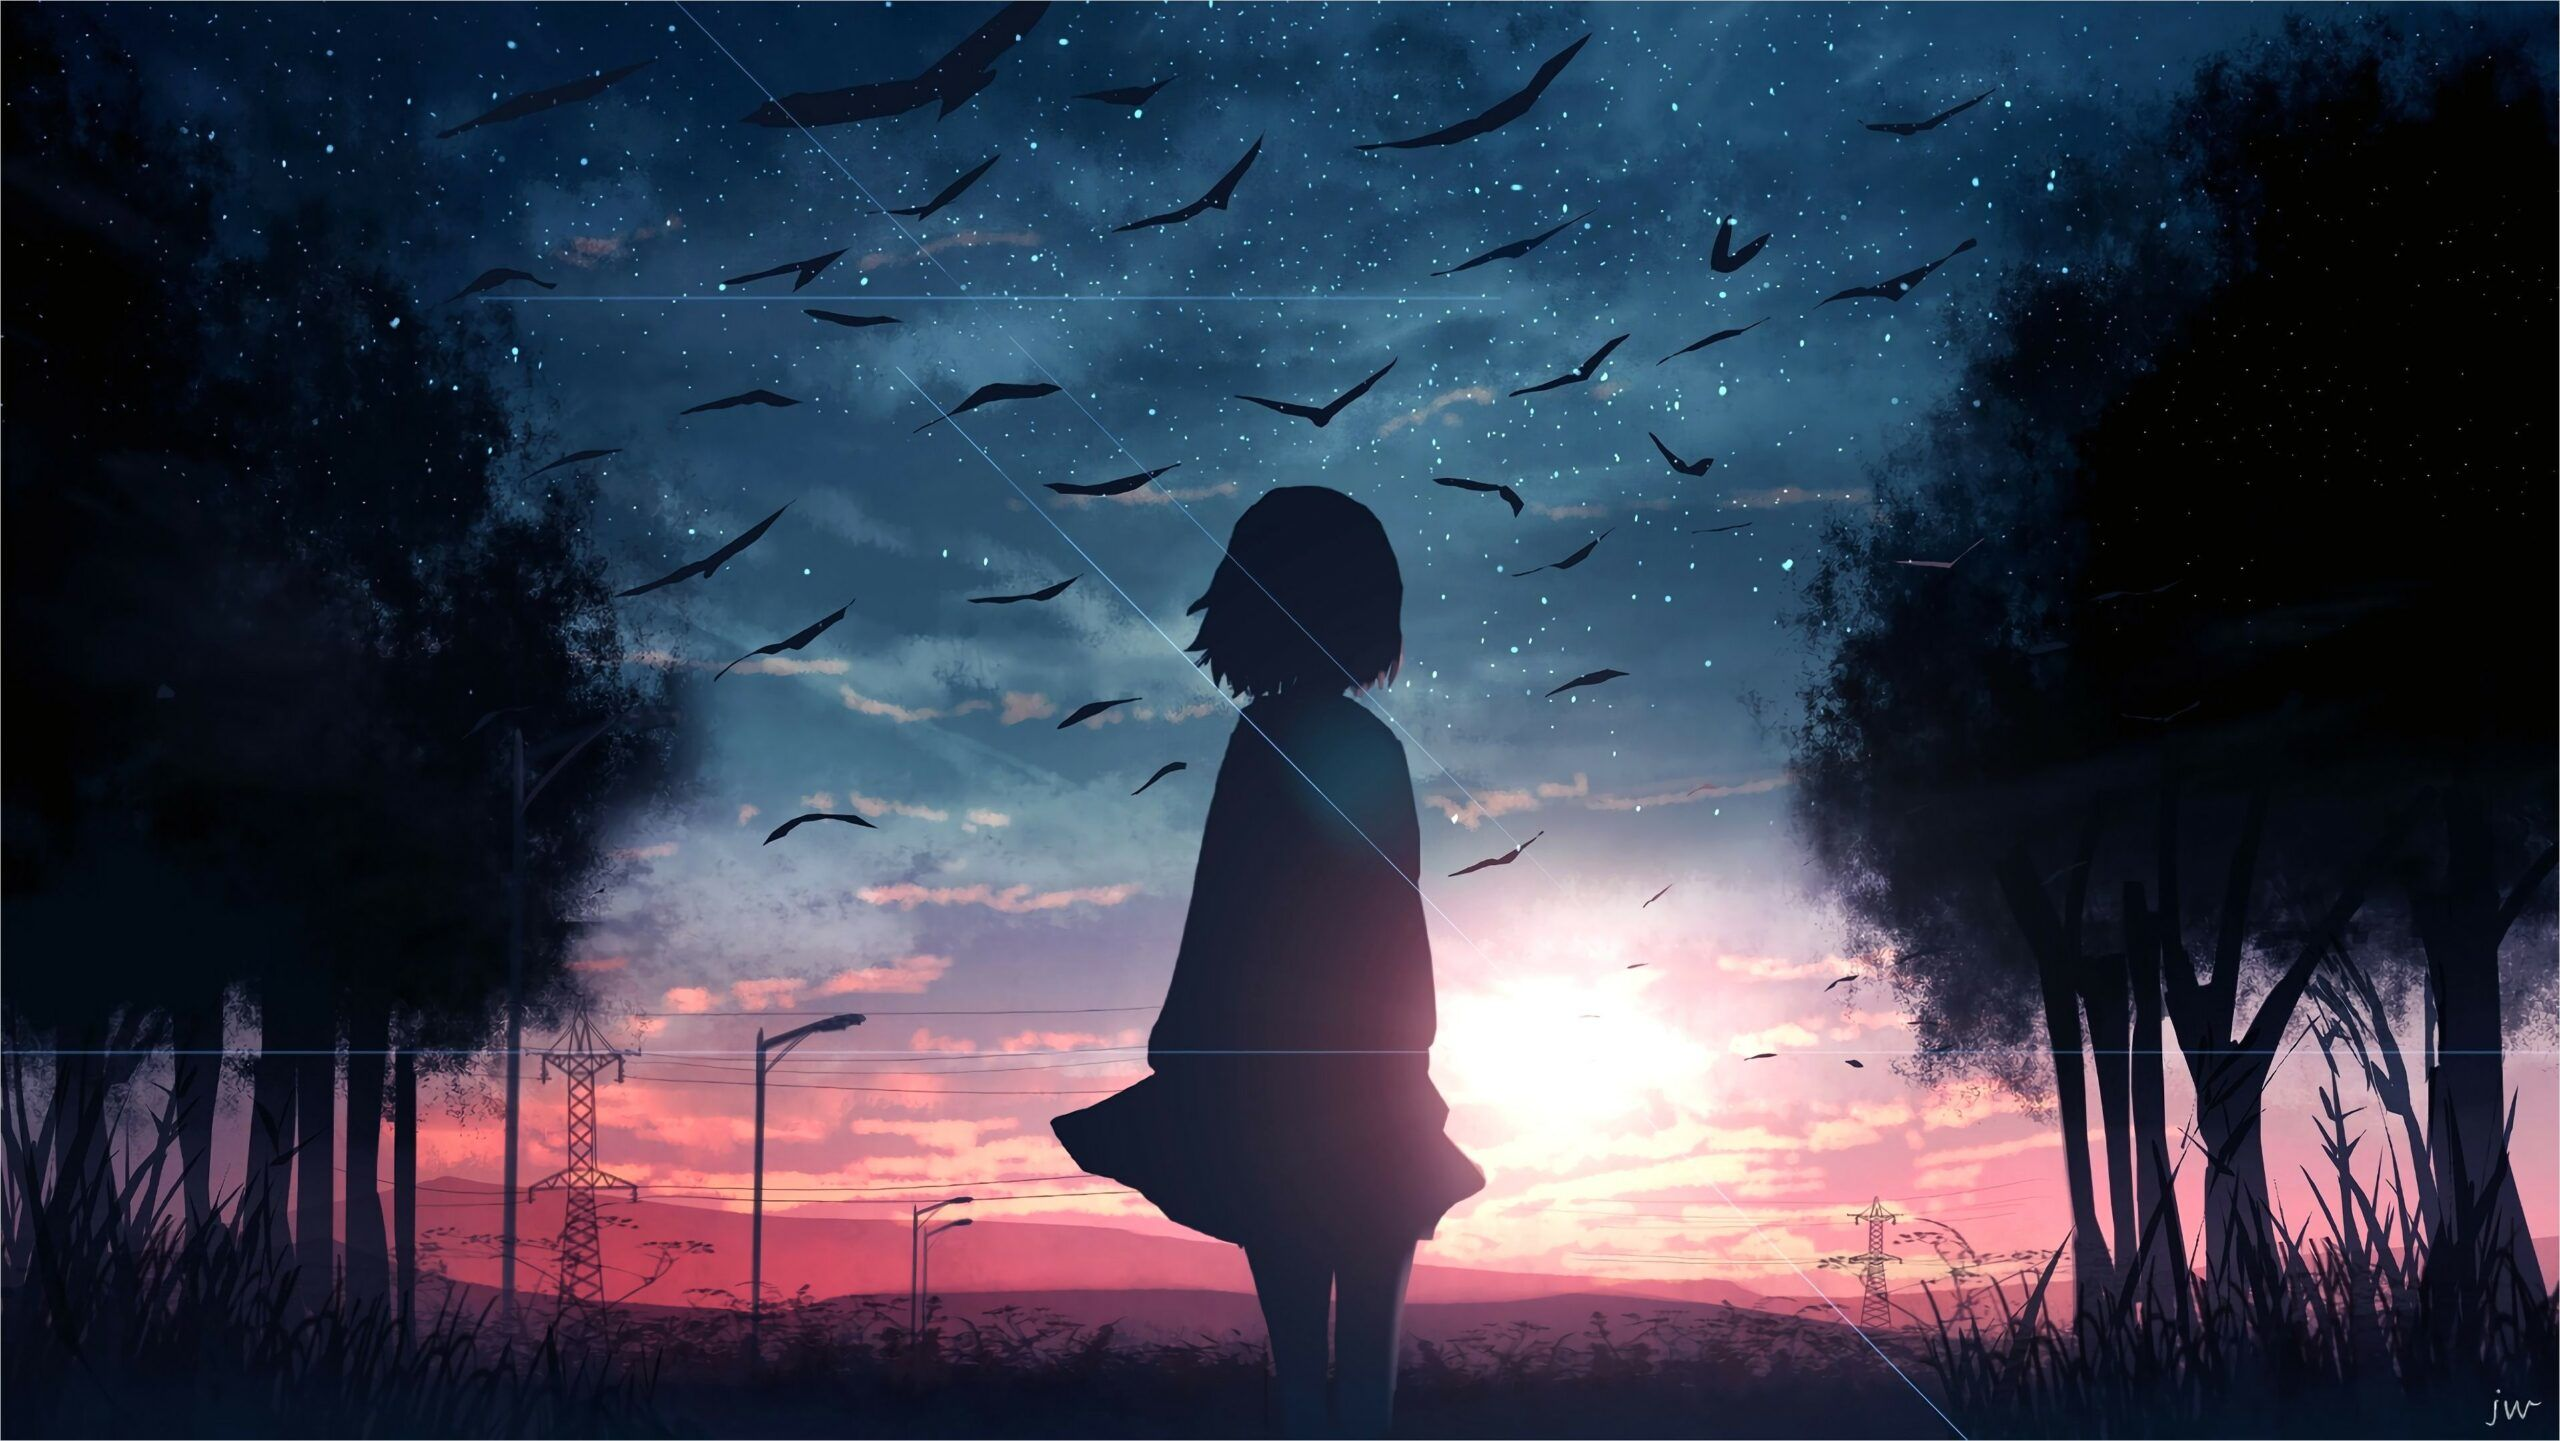 Anime Sad Landscape Wallpapers - Wallpaper Cave